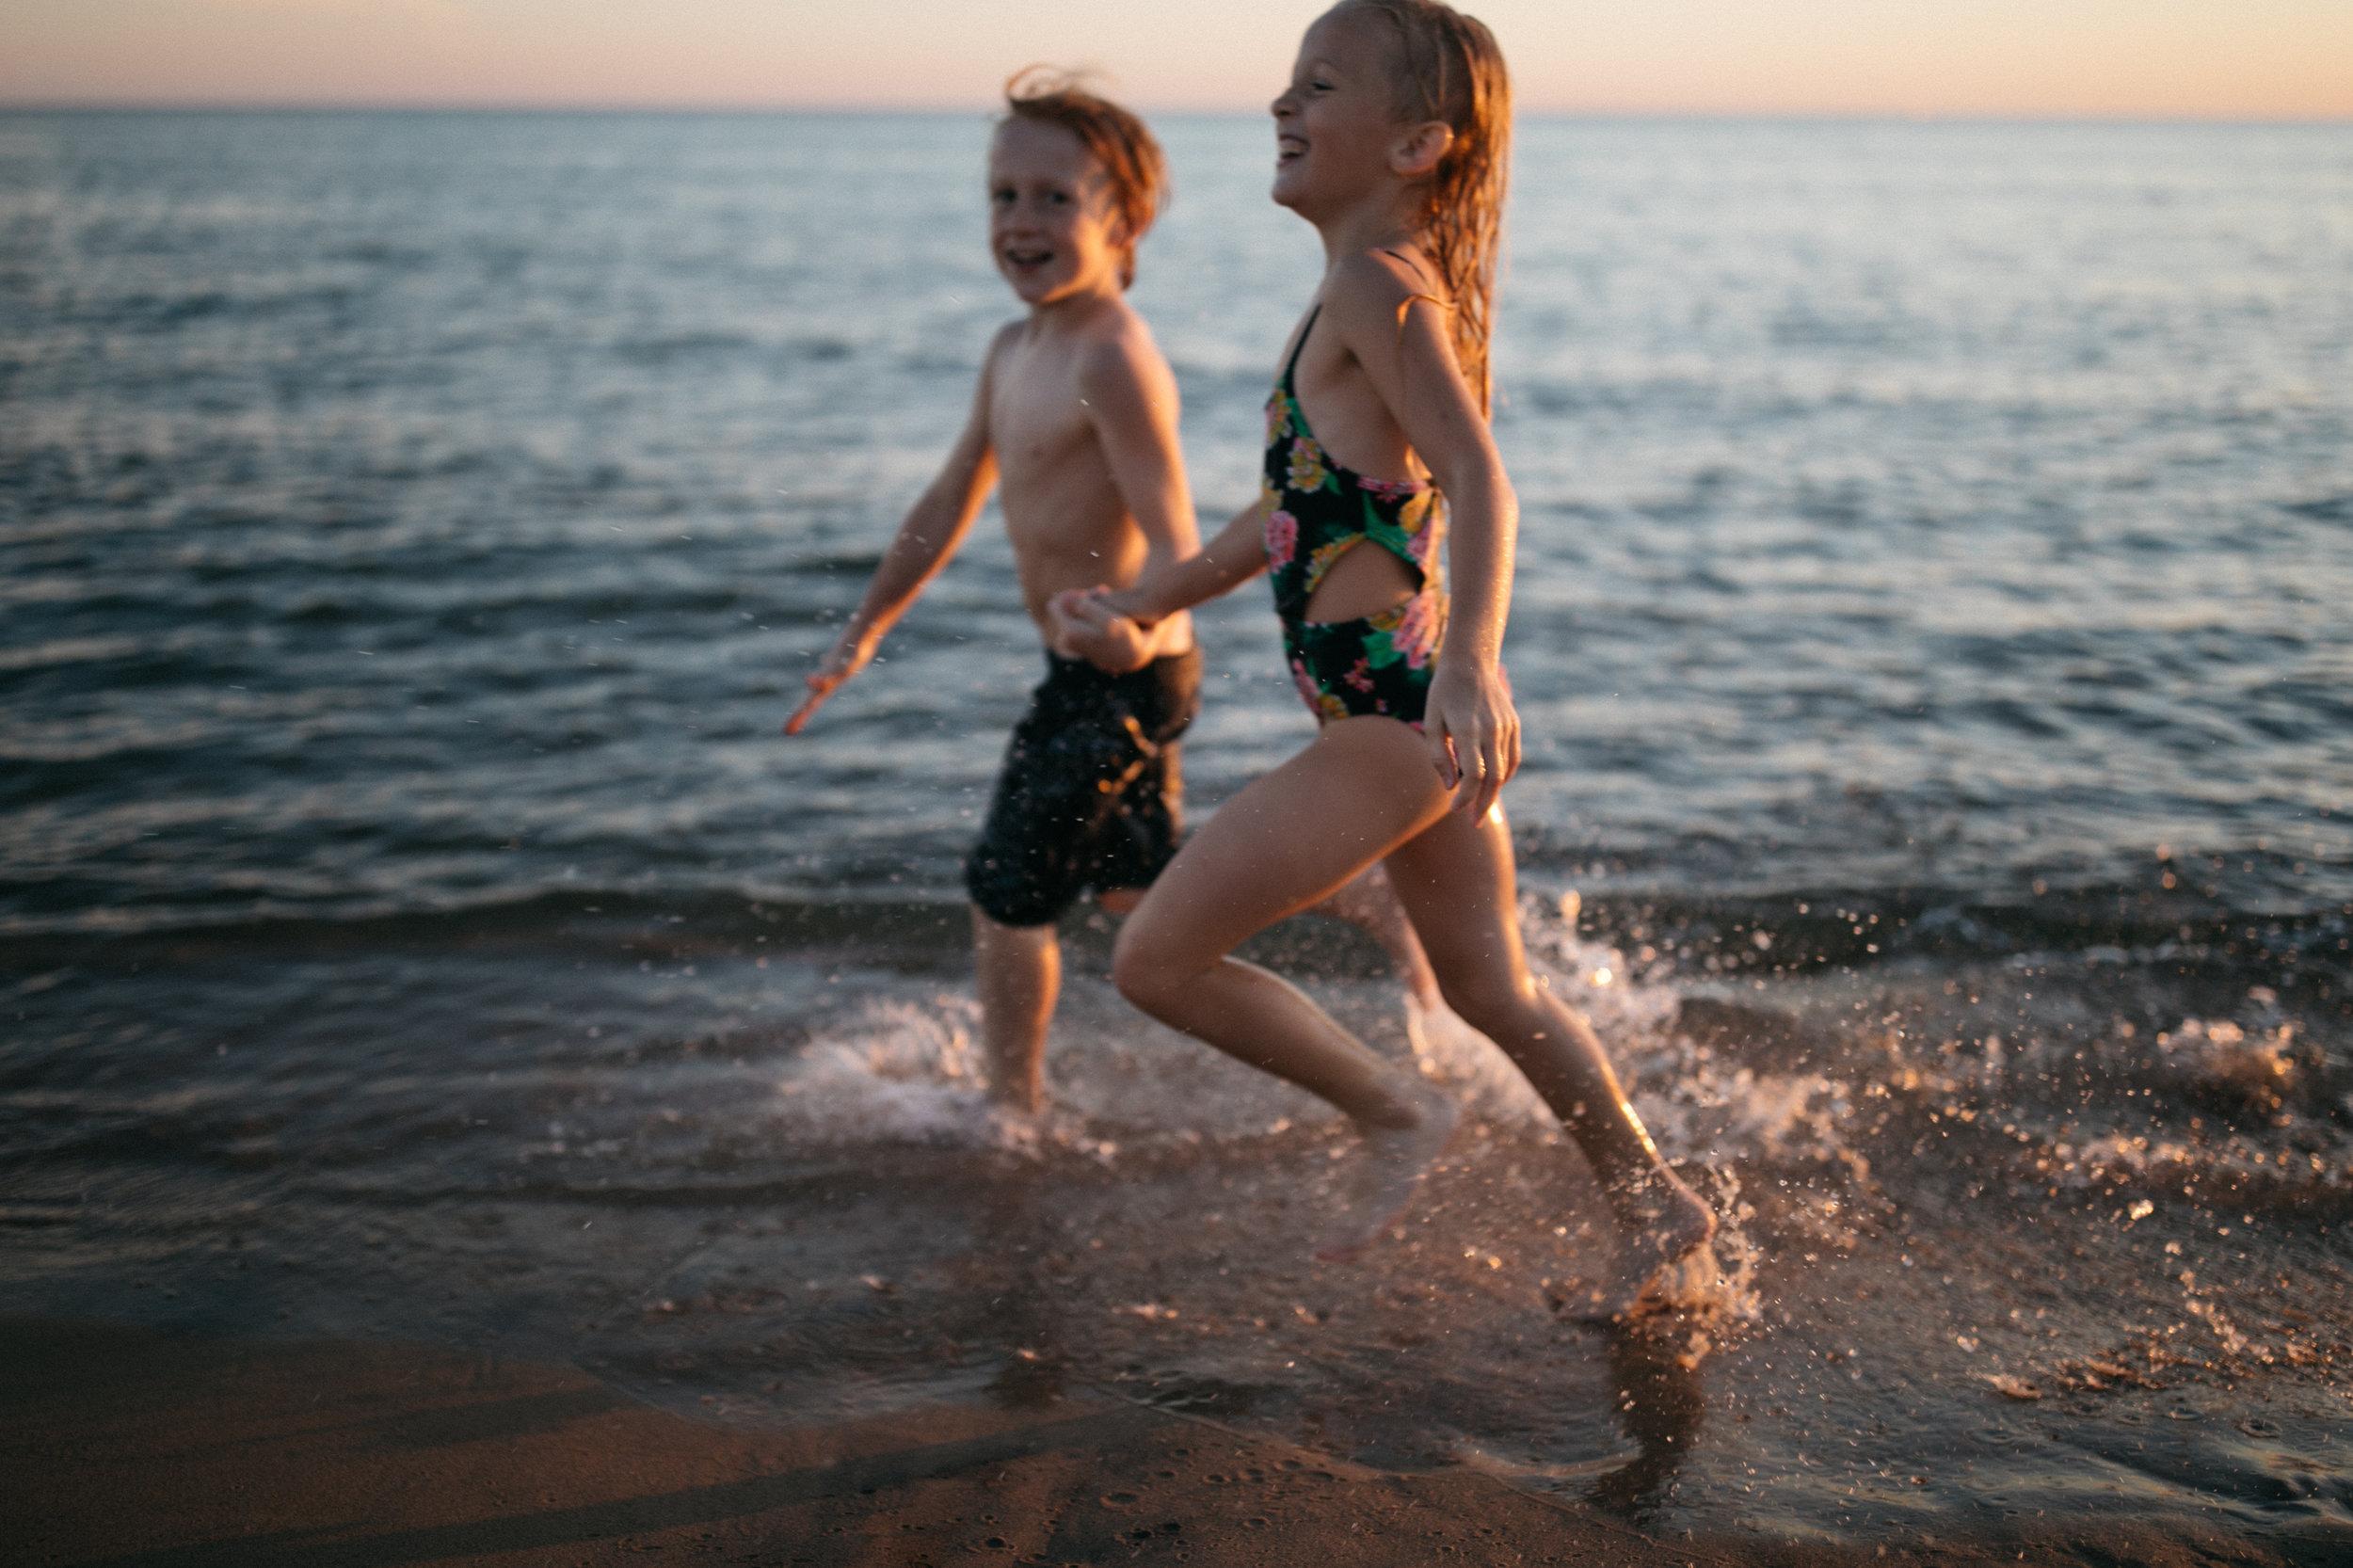 michigan-storytelling-photographer-ludington-beach-live-264.jpg